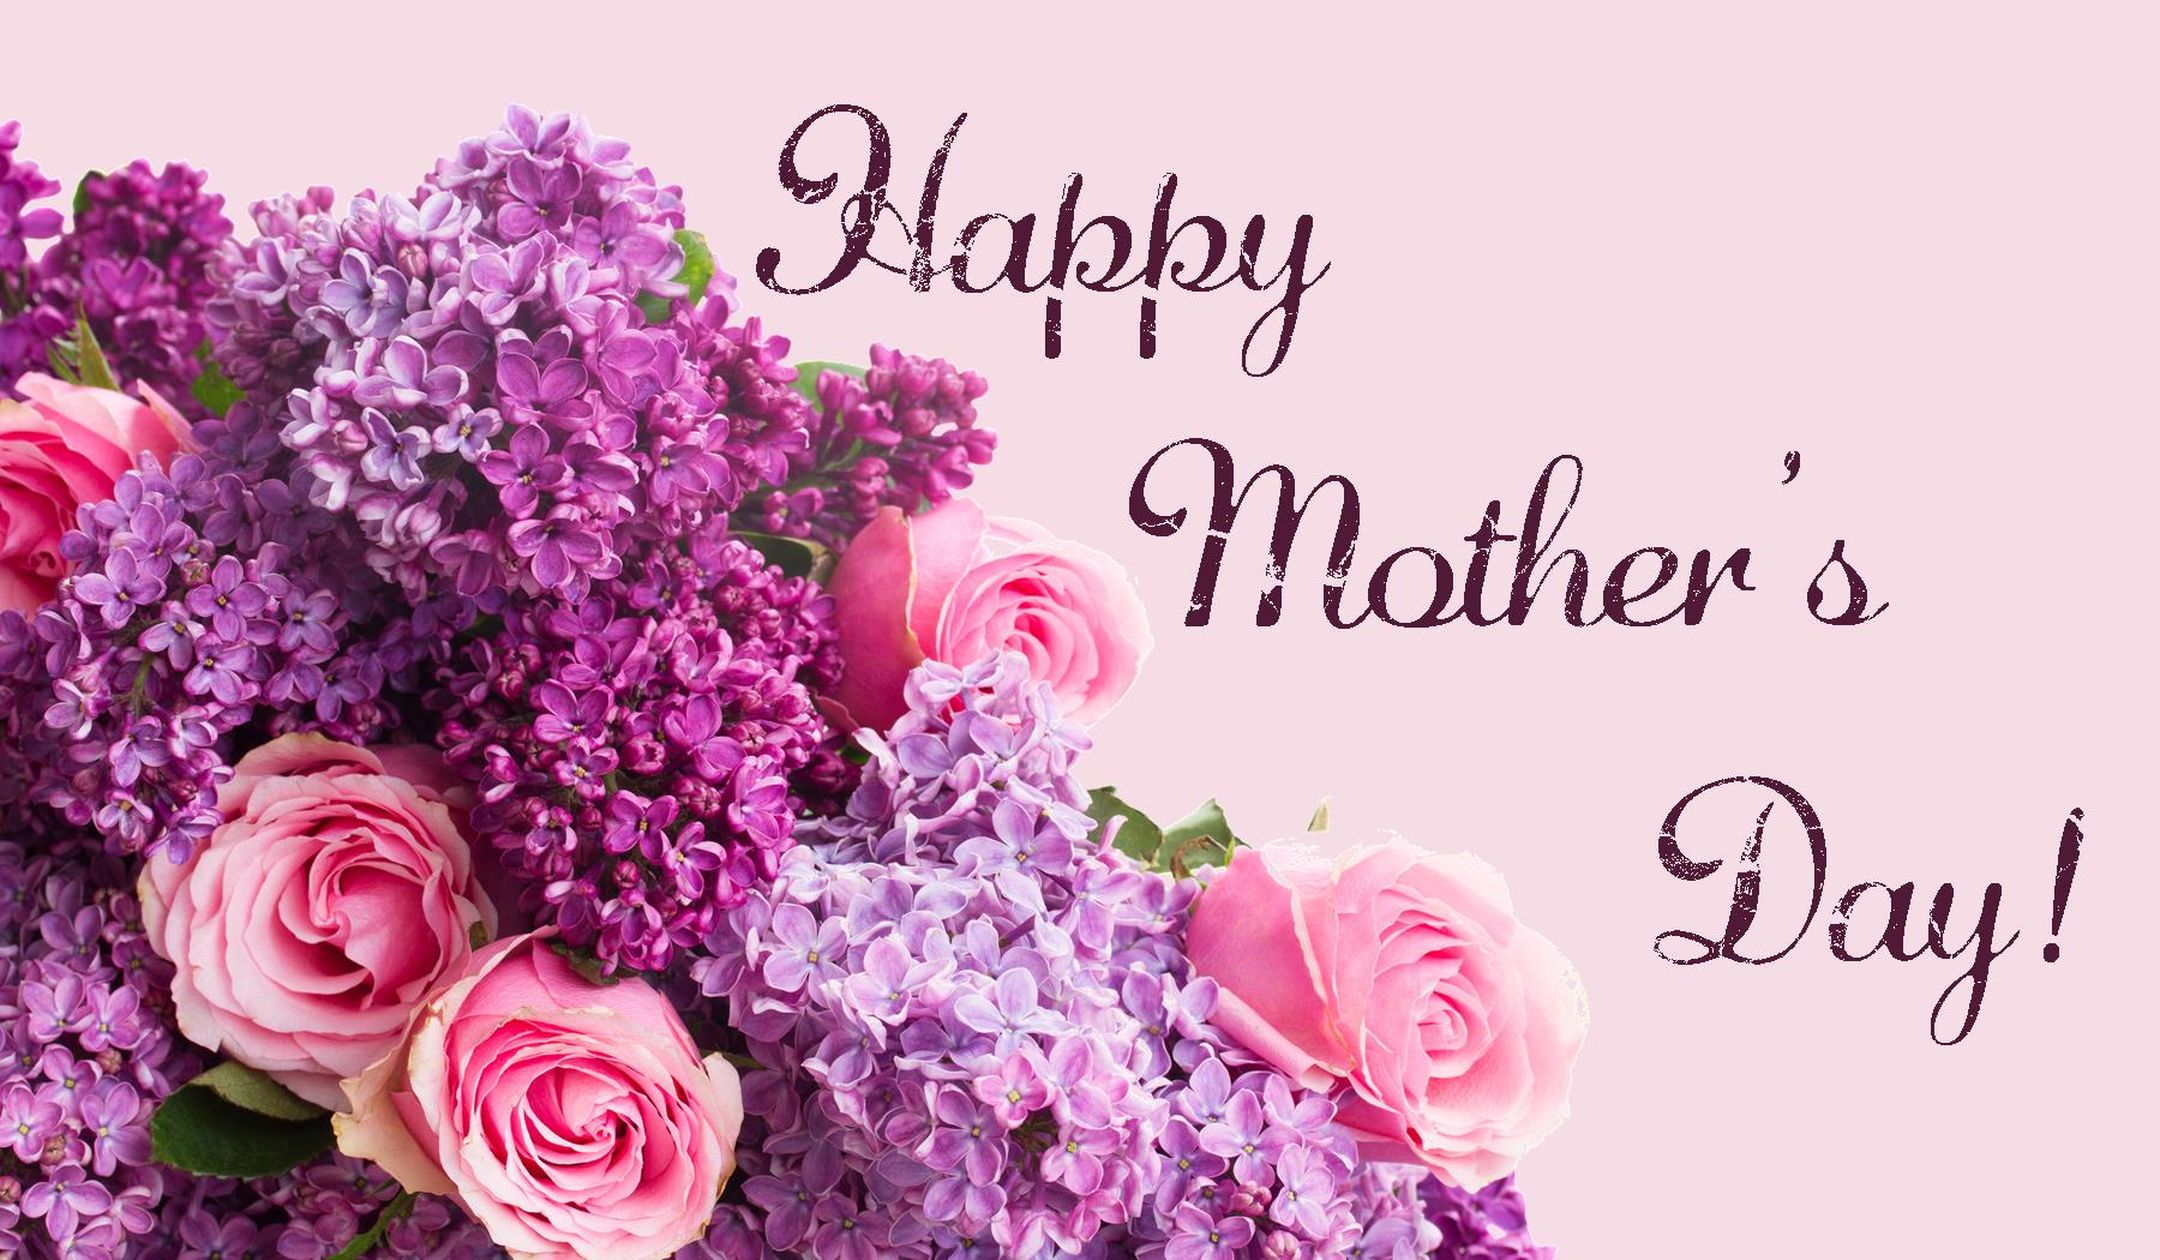 Download Original Image 2160 X 1260 Px   Background Happy Mothers 2160x1260